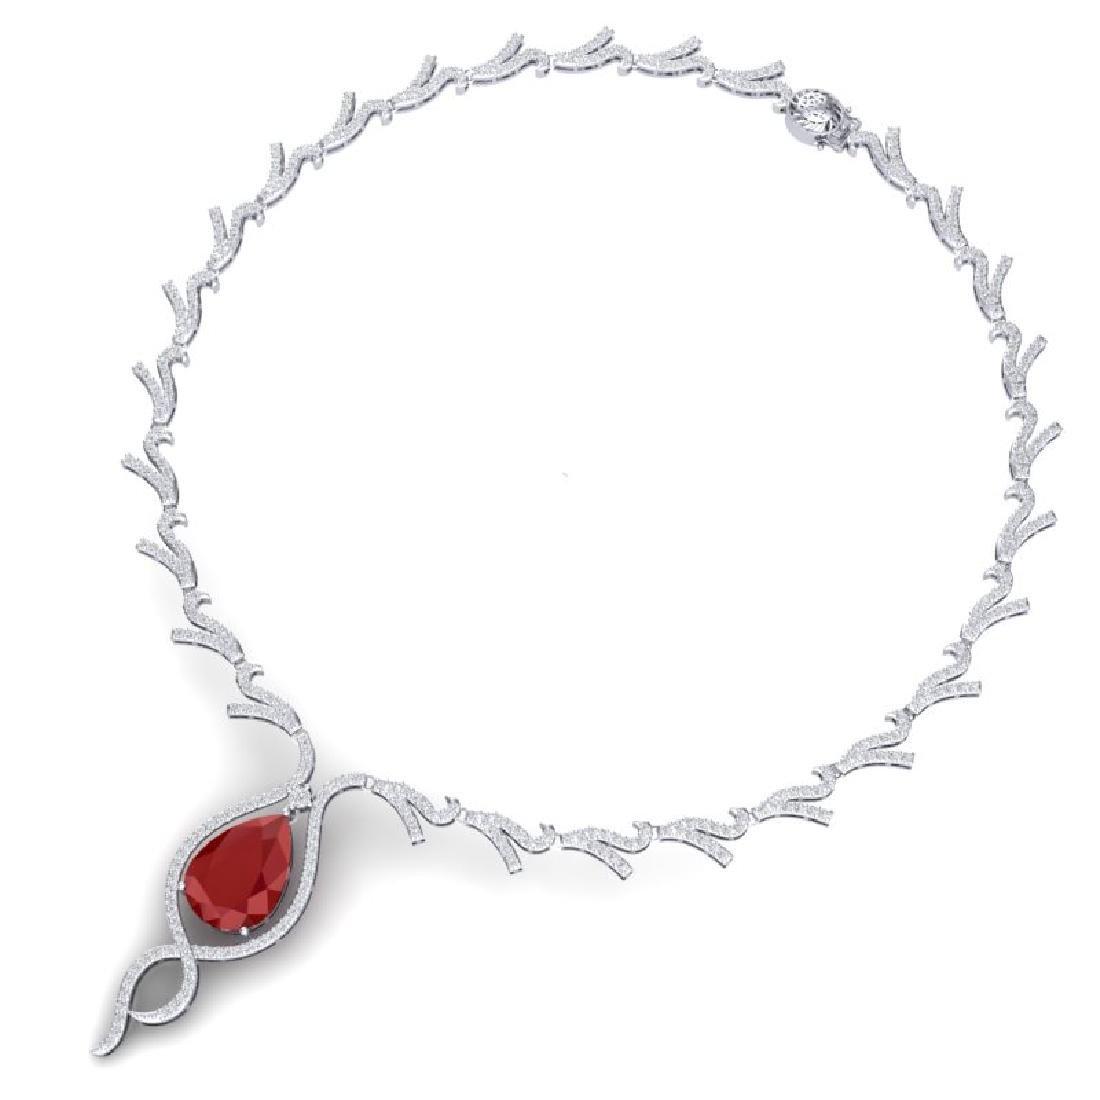 23.43 CTW Royalty Ruby & VS Diamond Necklace 18K White - 2